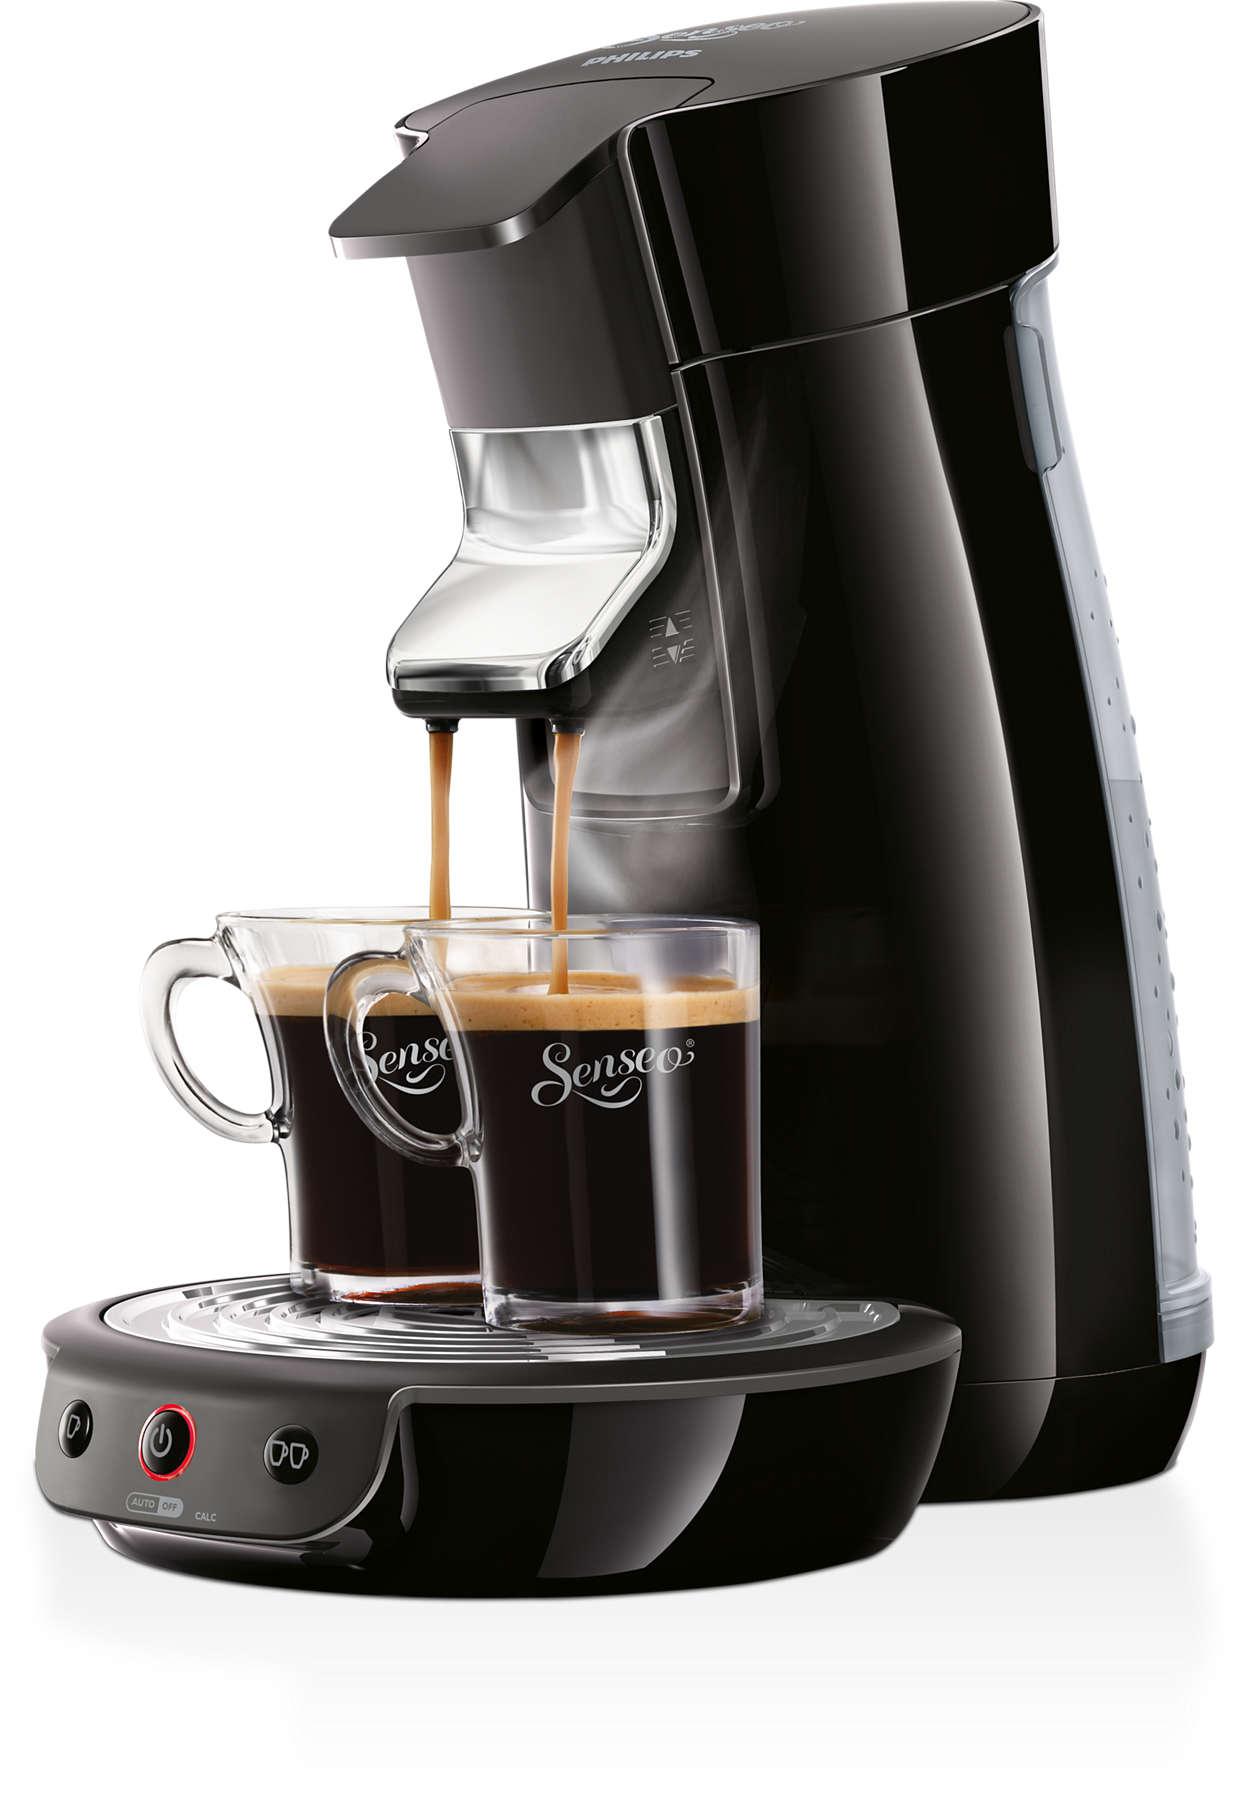 viva caf kaffeepadmaschine hd7825 60 senseo. Black Bedroom Furniture Sets. Home Design Ideas